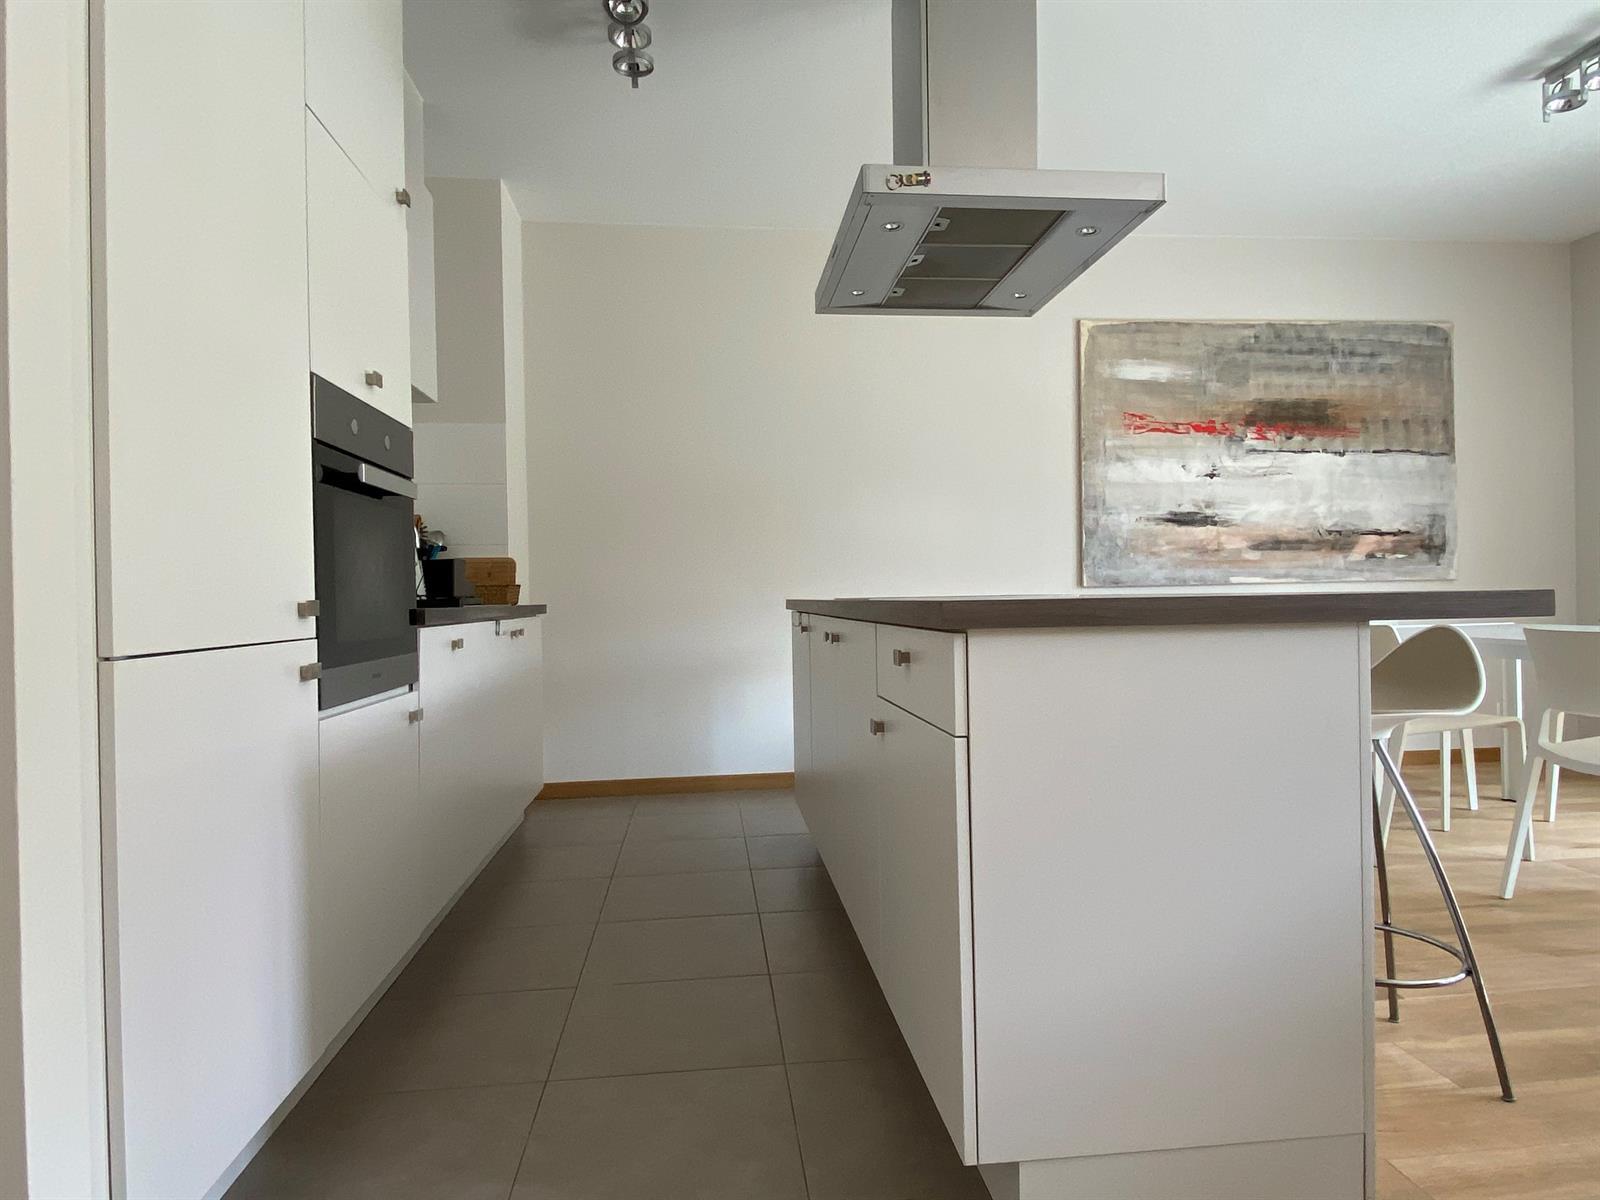 Flat - Etterbeek - #4389571-3